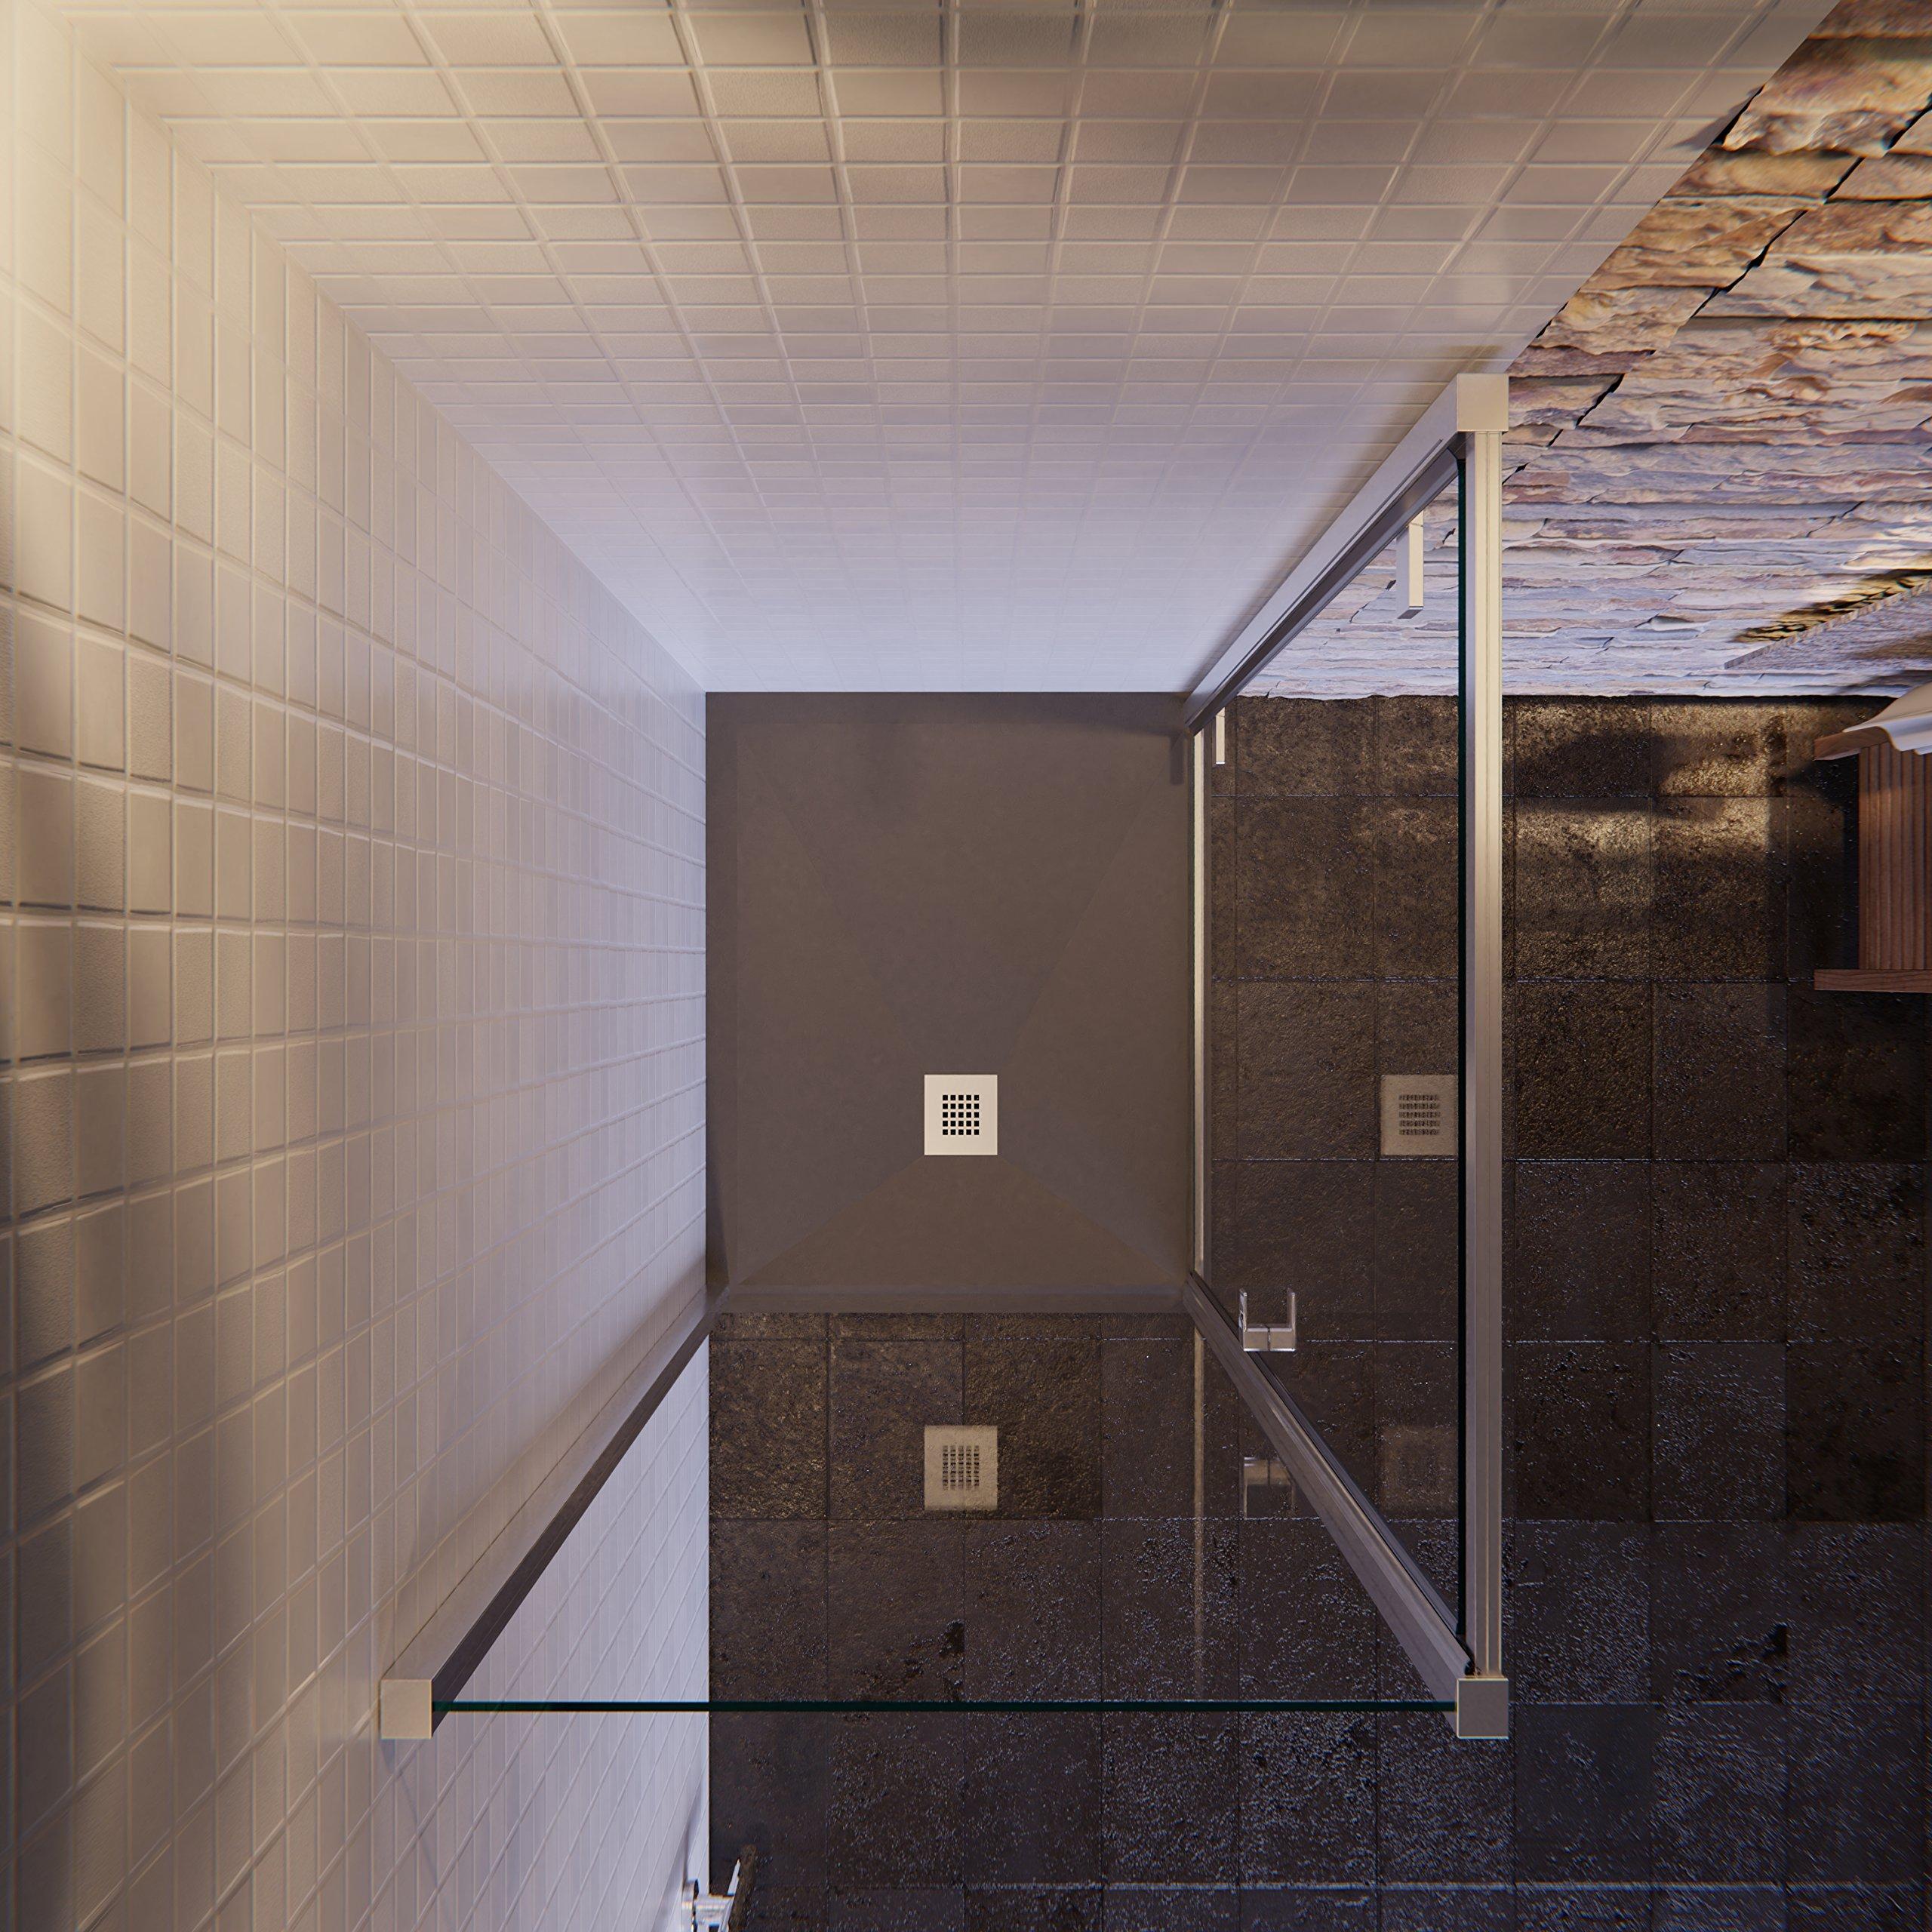 Olimpo duchas ga-70 X 70 ducha cabina 6 mm diseño puerta aldaba ...